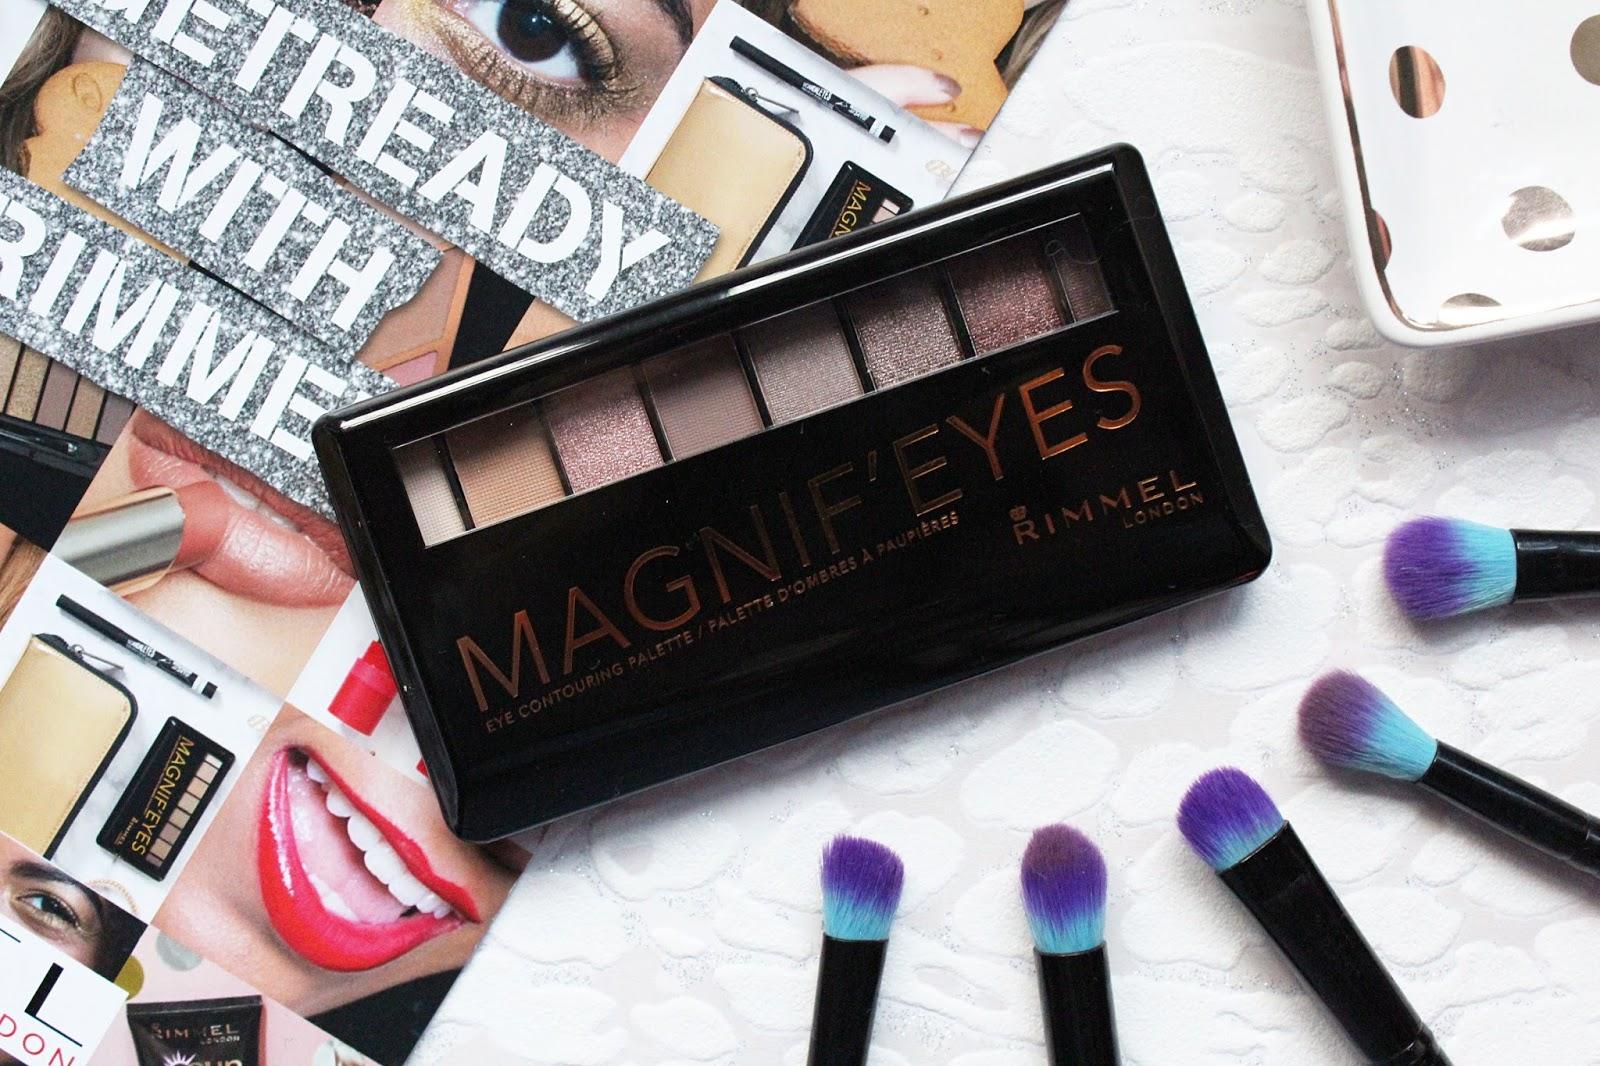 Rimmel Magnifi'eyes Eyeshadow Palette